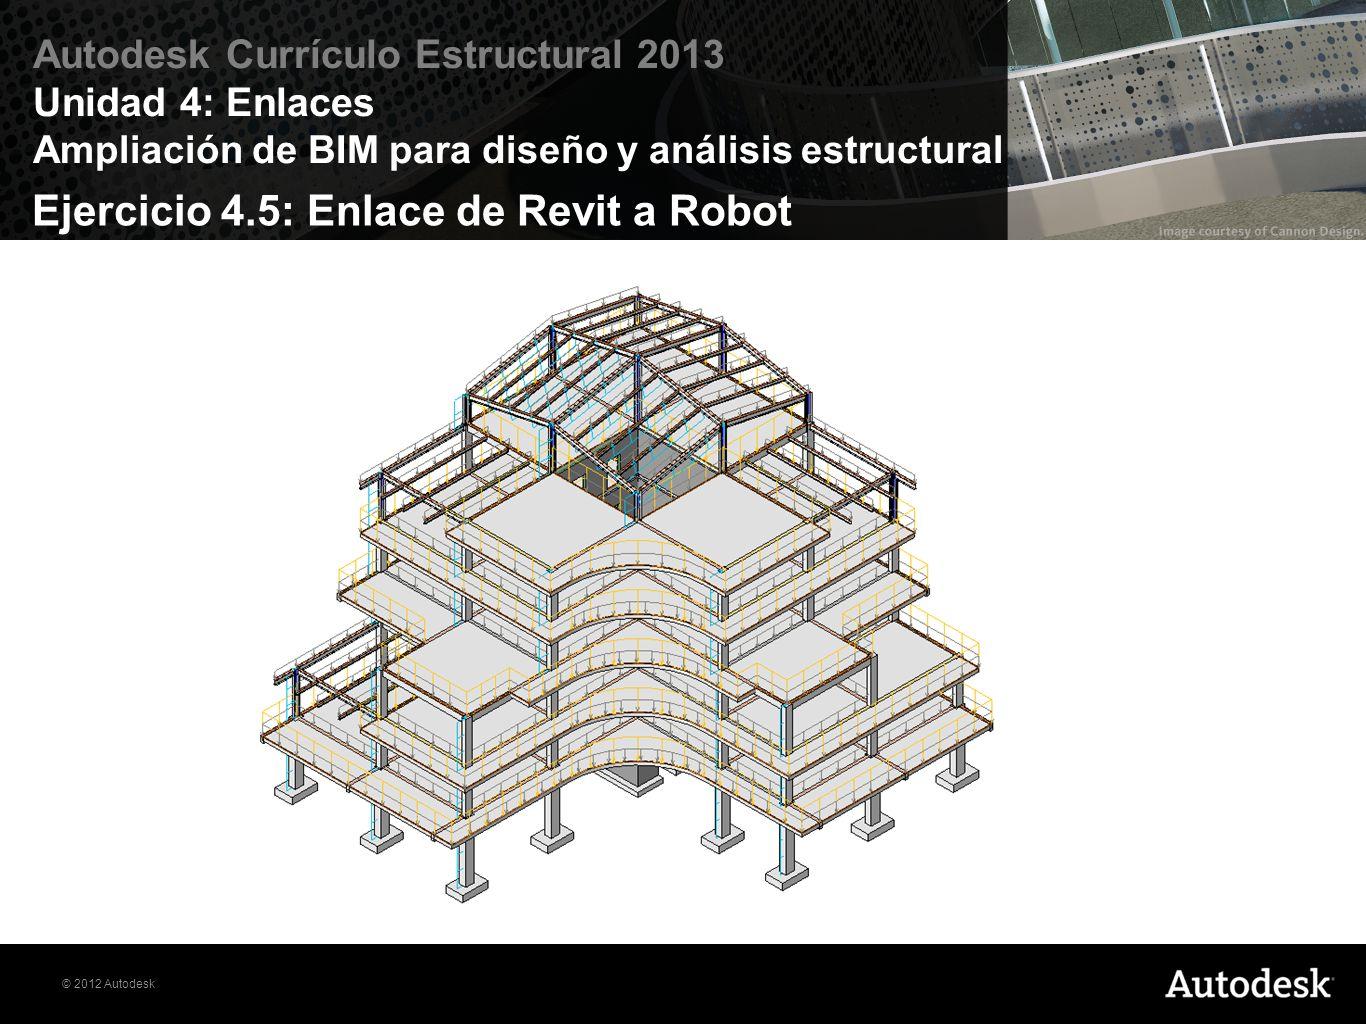 Ejercicio 4.5: Enlace de Revit a Robot